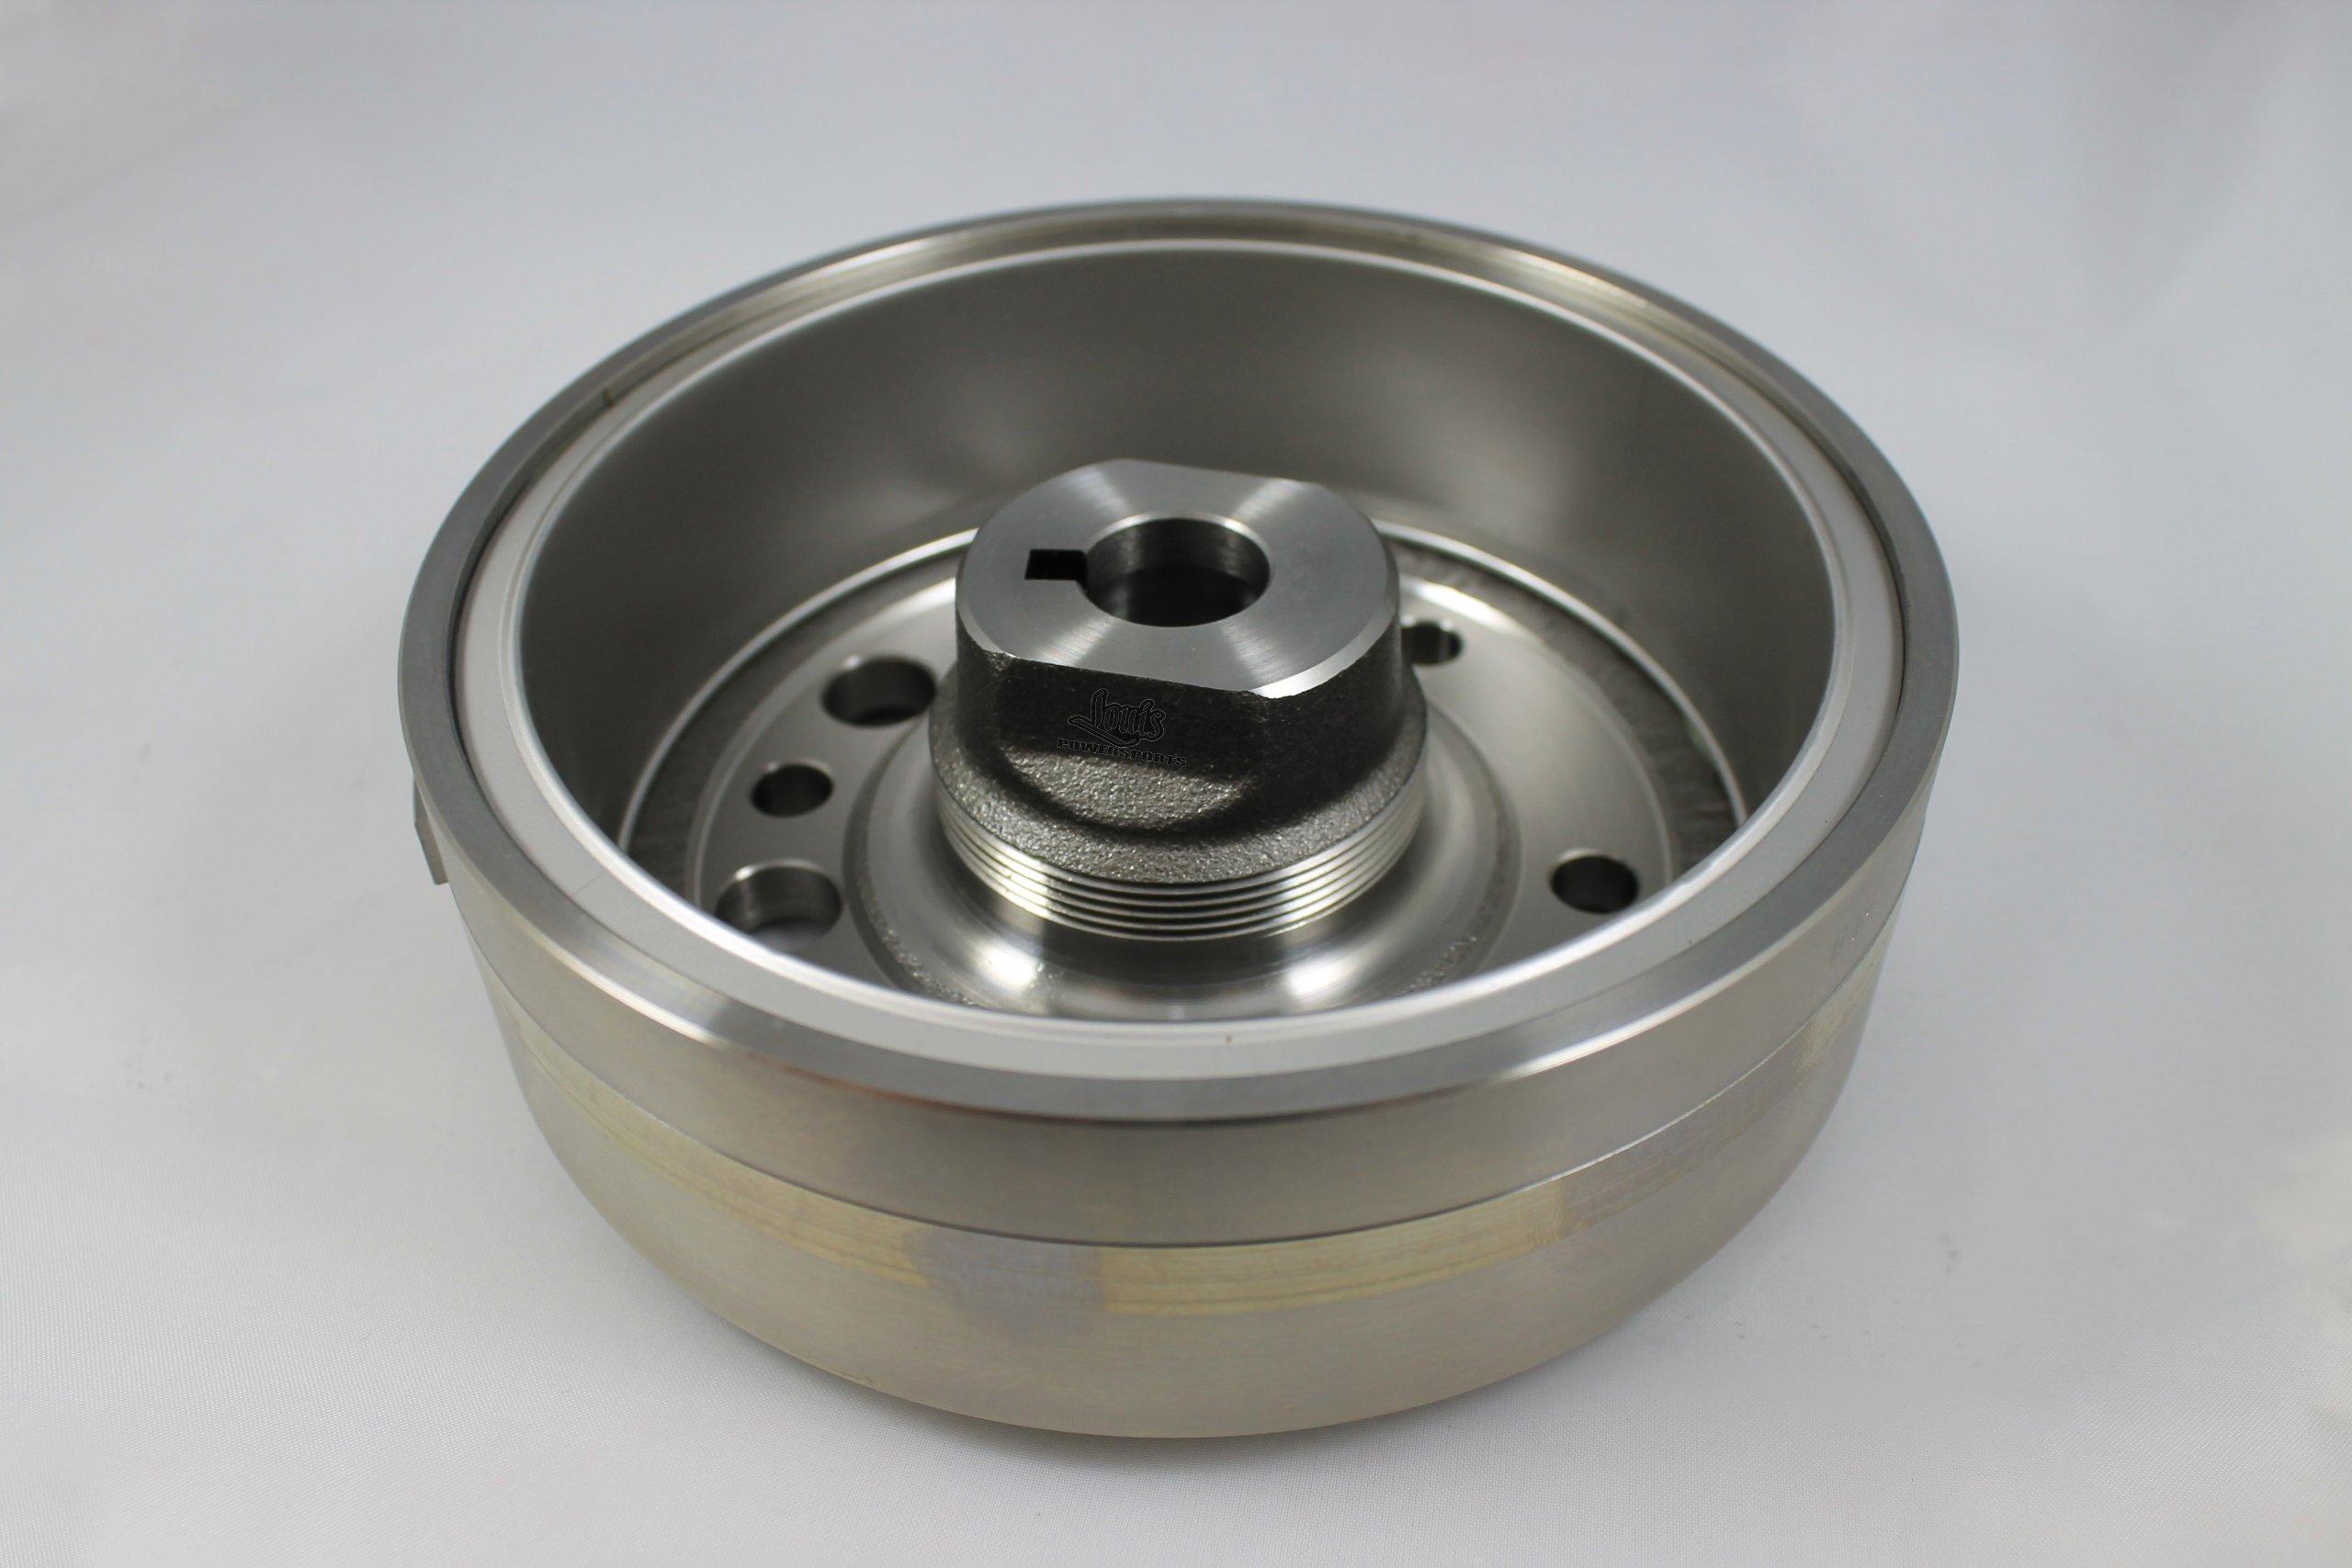 Cheap Suzuki Eiger Wiring Diagram Find 400 Engine Get Quotations New Oem Rotor Magnetic Flywheel Magneto 2002 2007 Ltf400 Lta400 32102